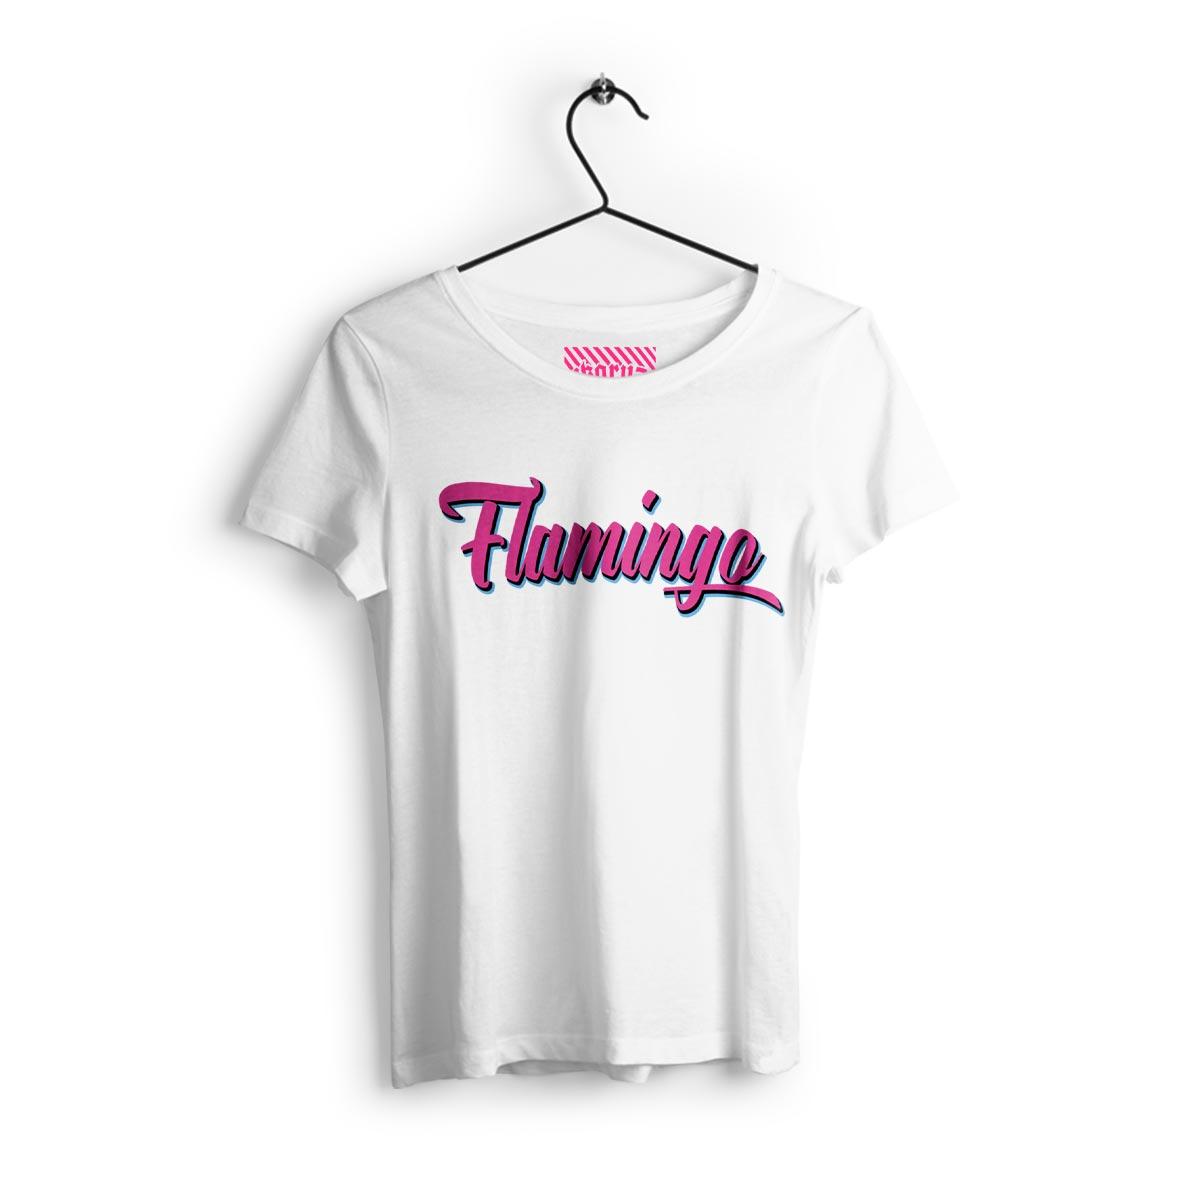 IKRZ | FLAMINGO | GIRLS WHITE SHIRT